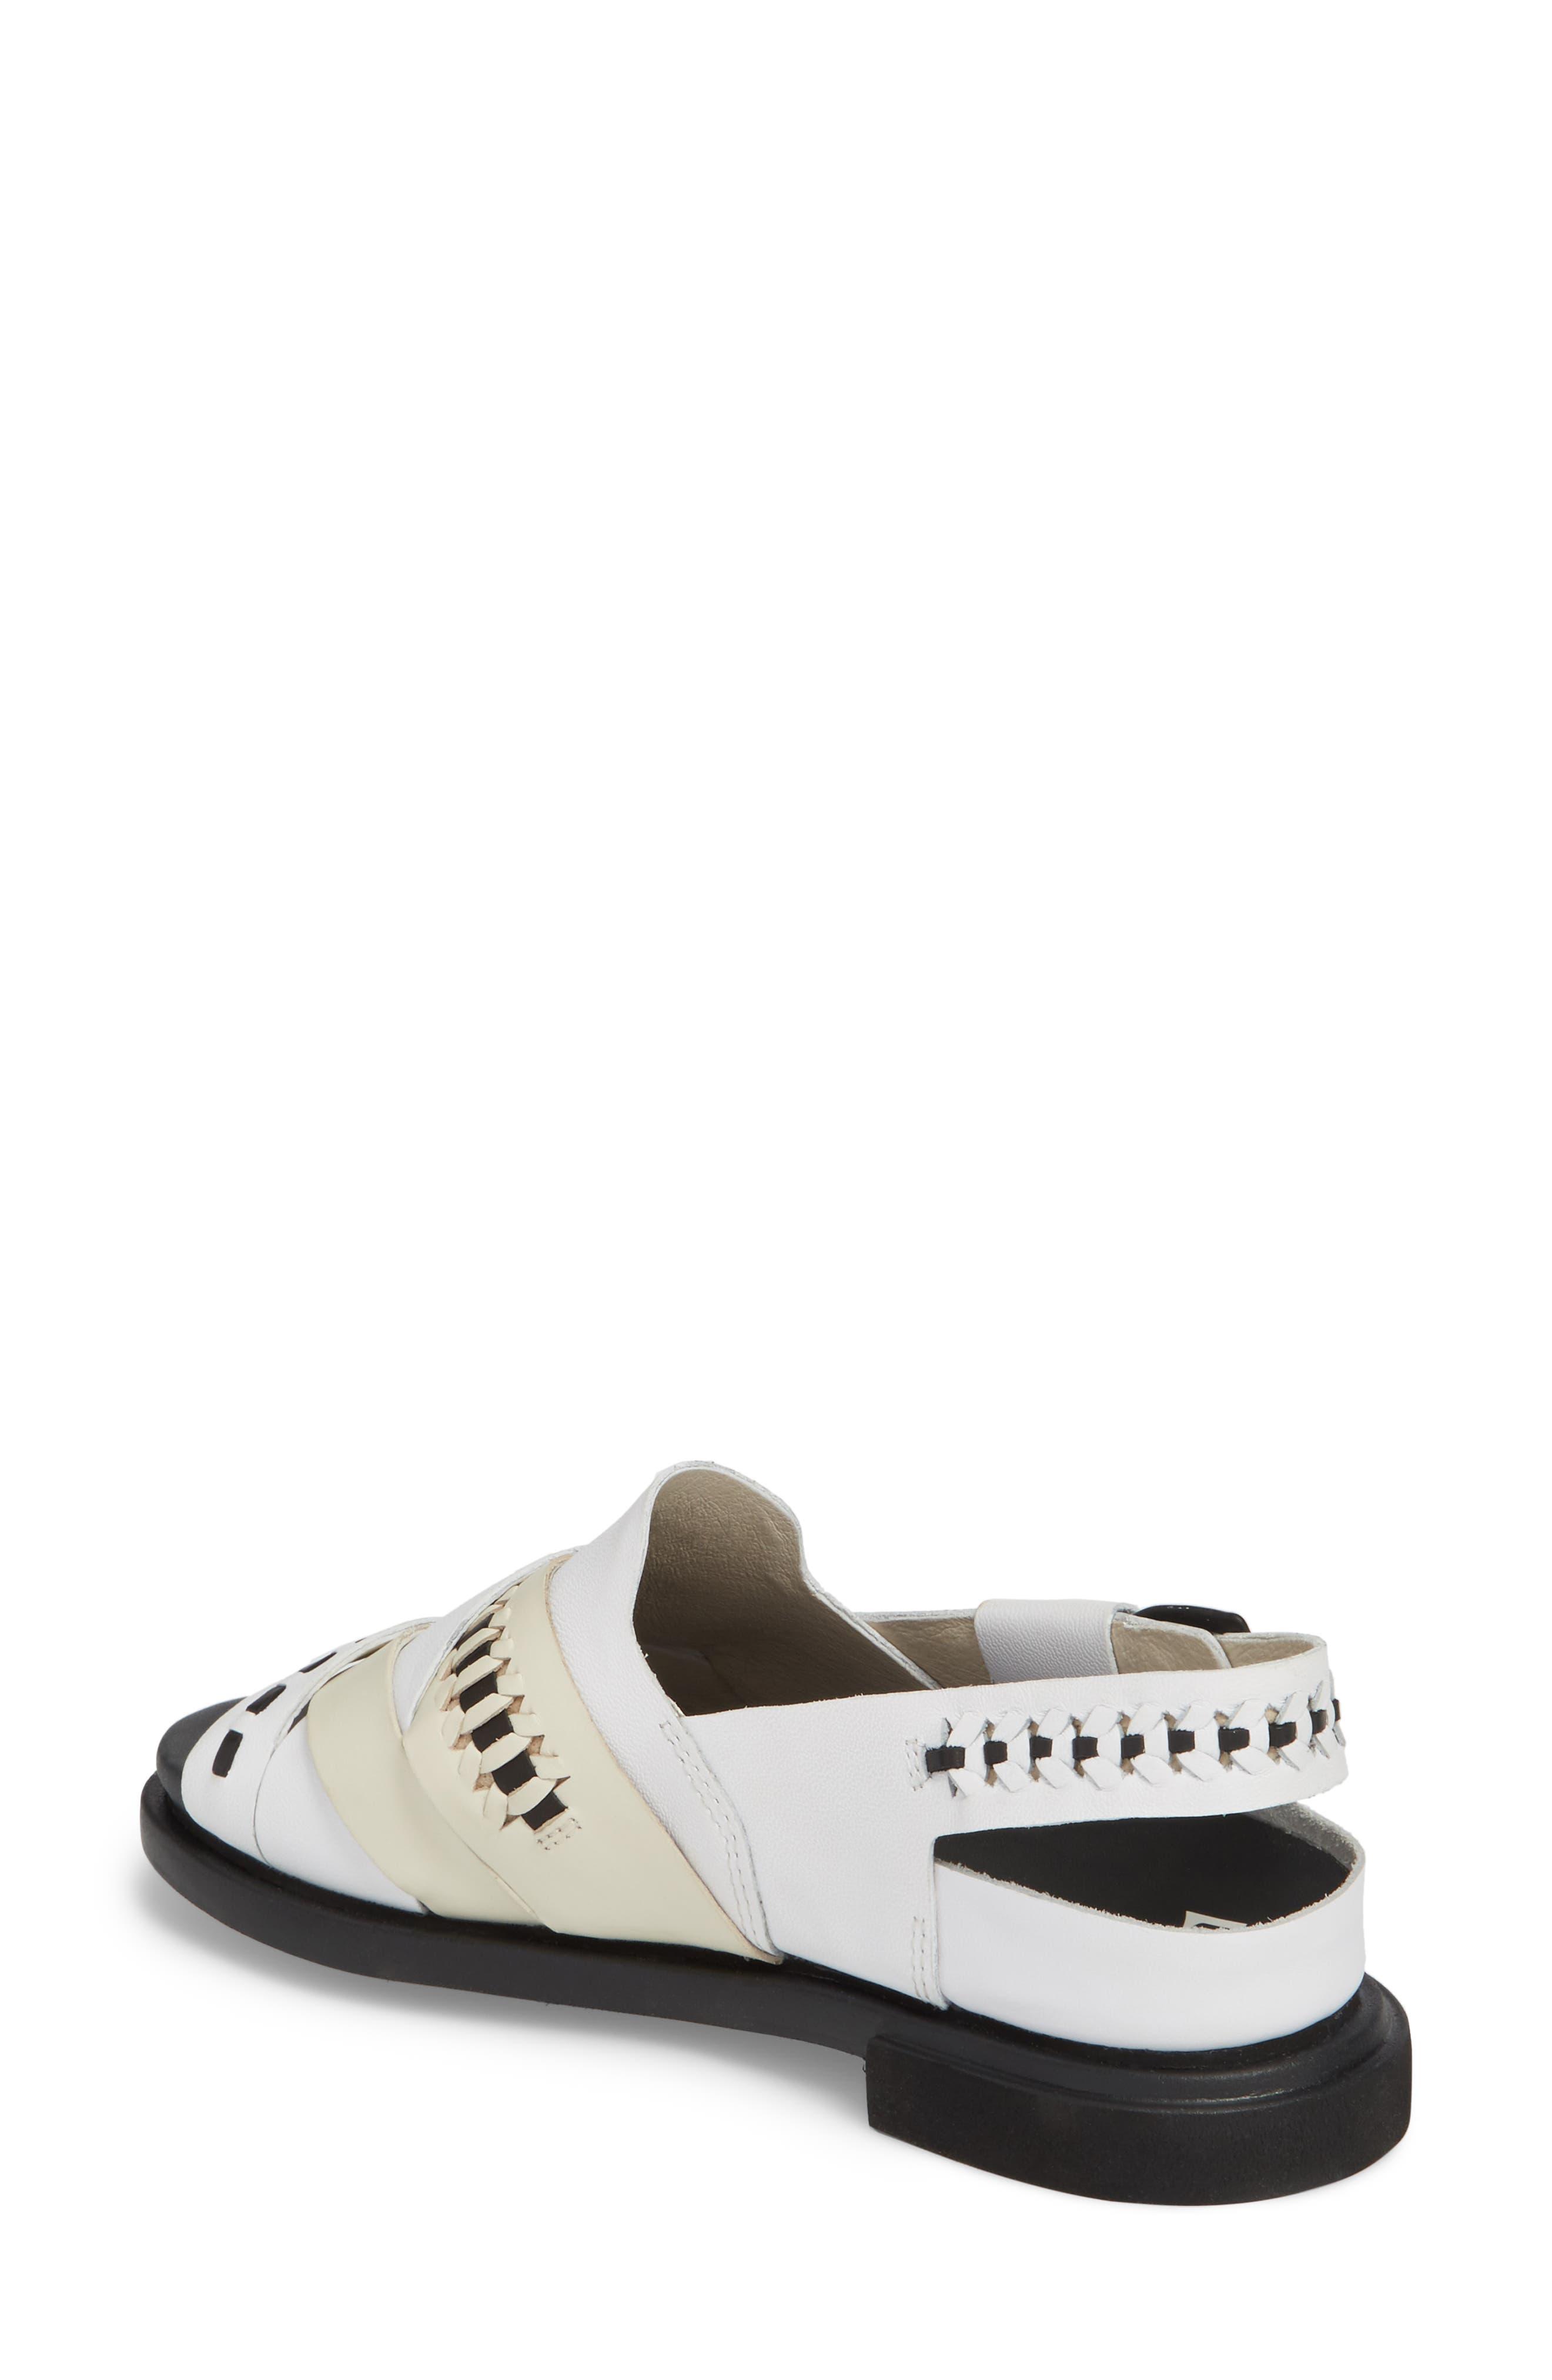 Twins Slingback Sandal,                             Alternate thumbnail 2, color,                             Multi - Assorted Leather